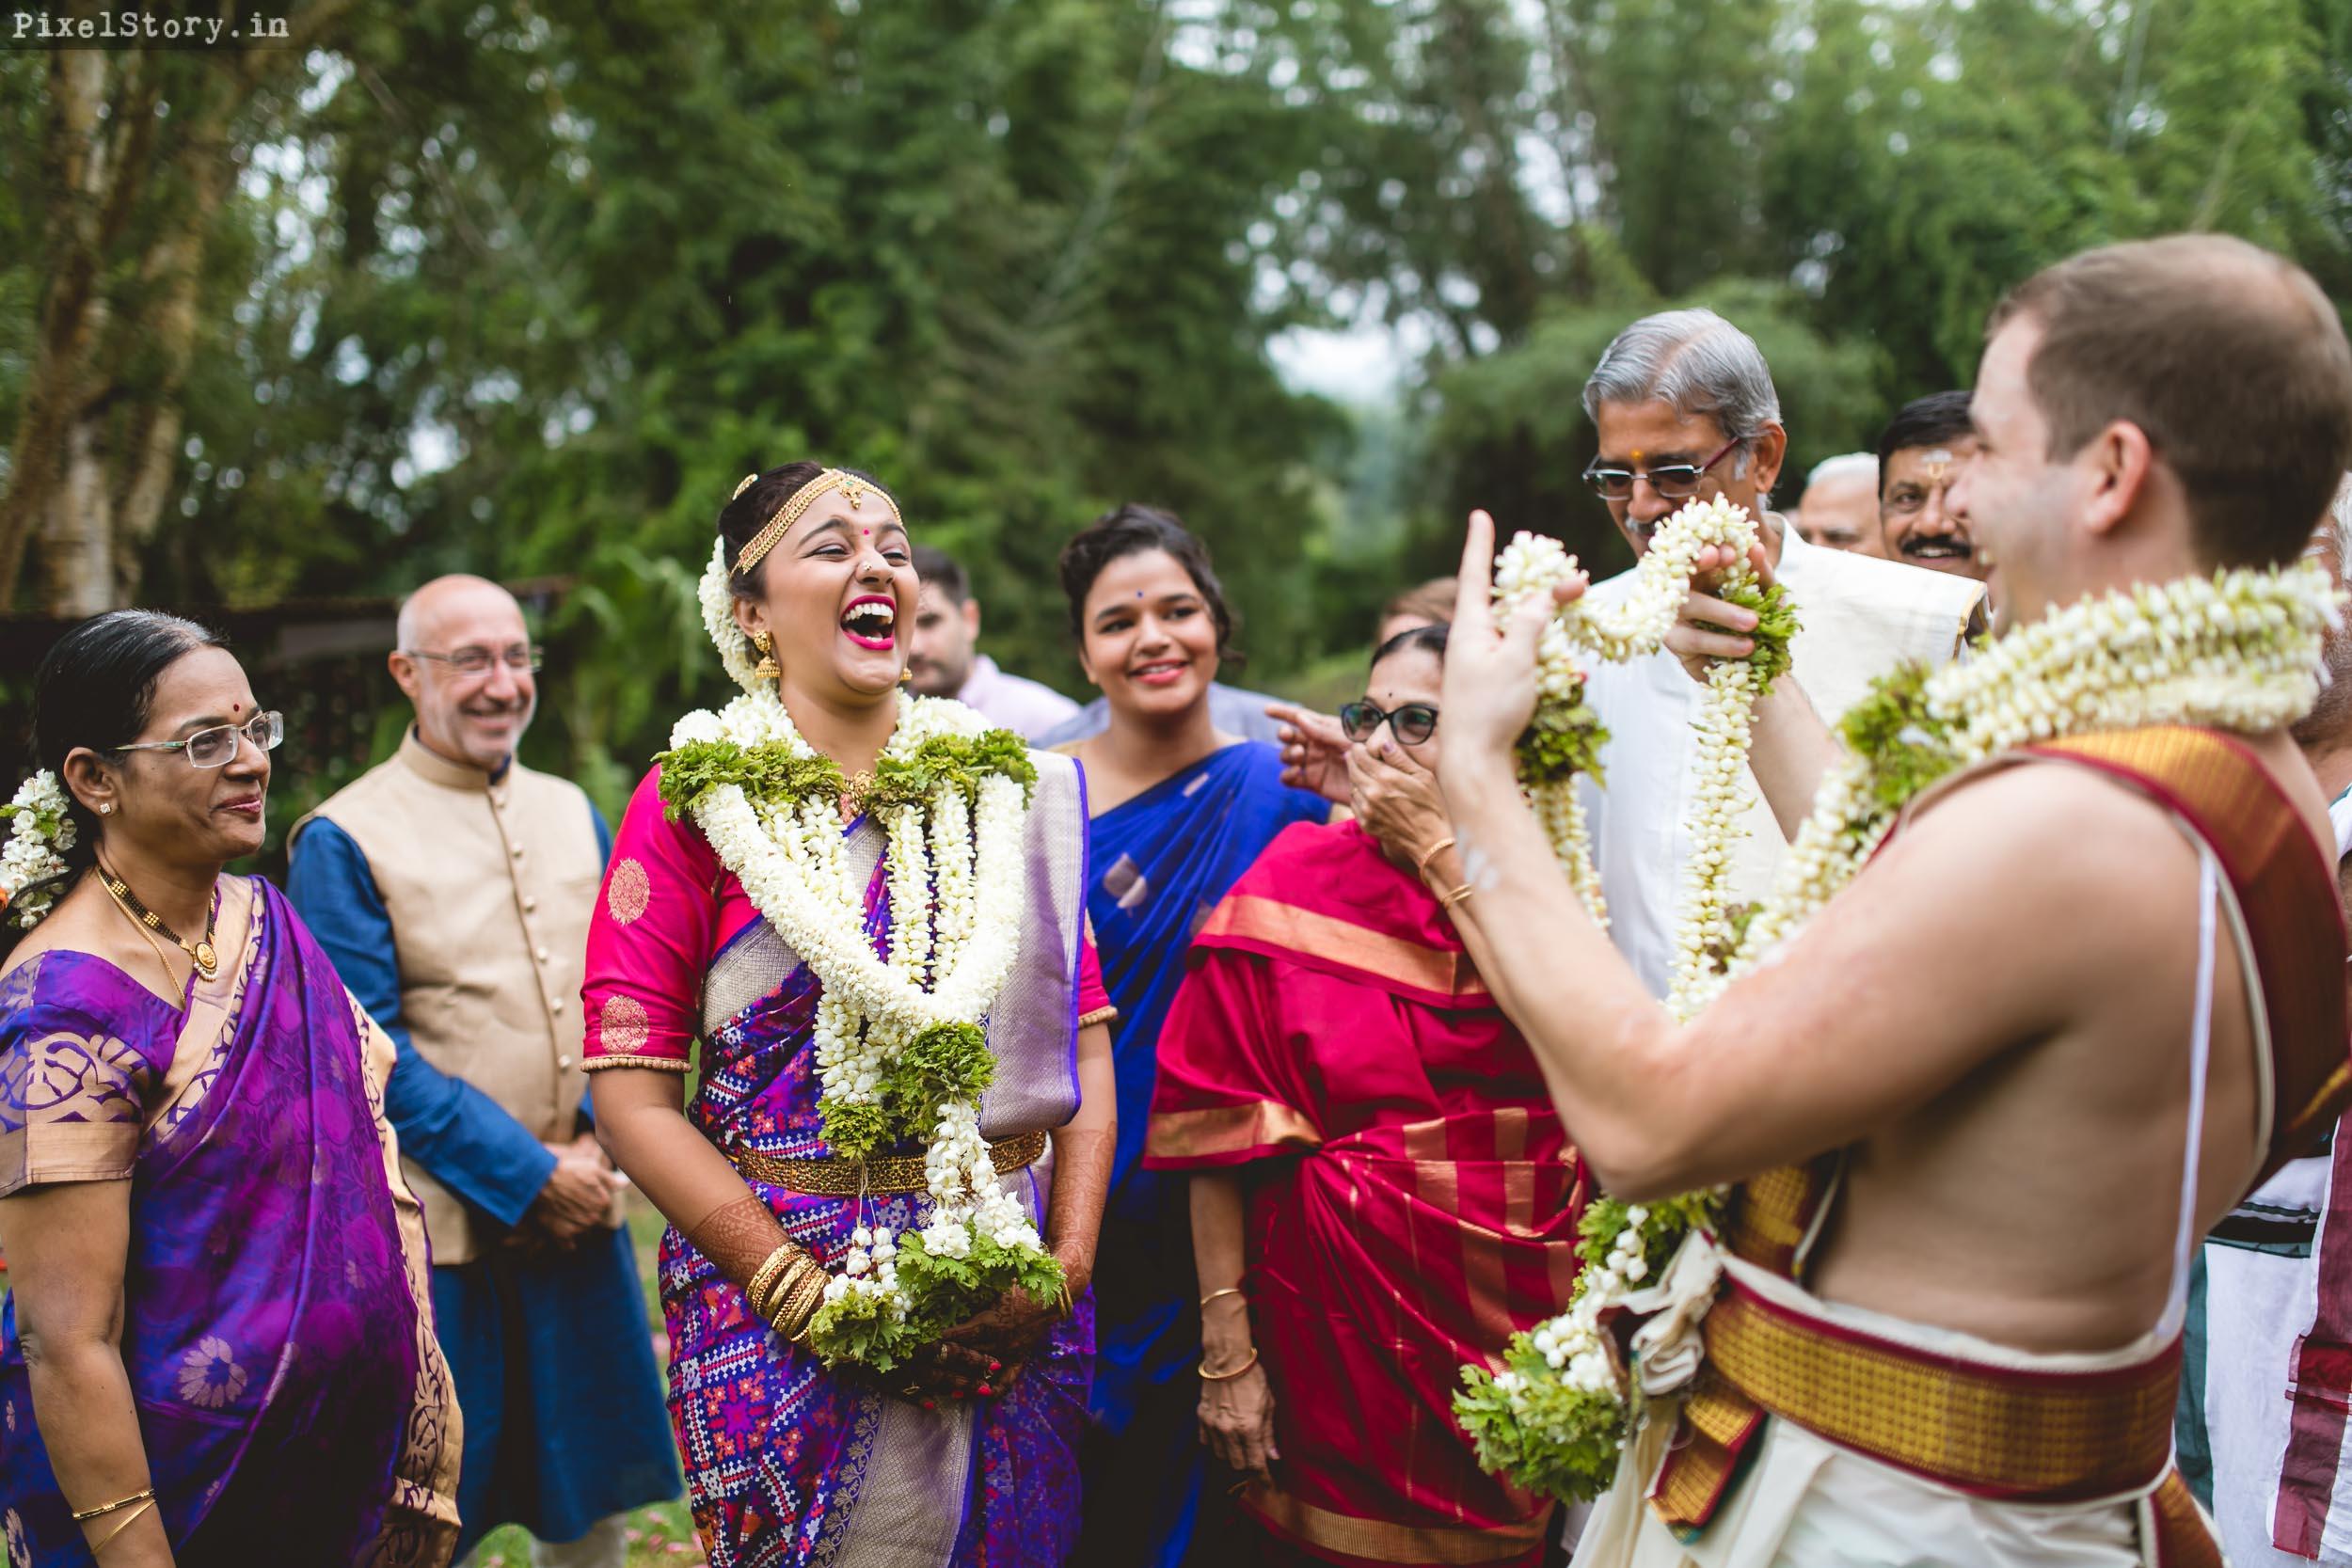 PixelStory-Jungle-Wedding-Photographer-Masinagudi-Indo-French030.jpg